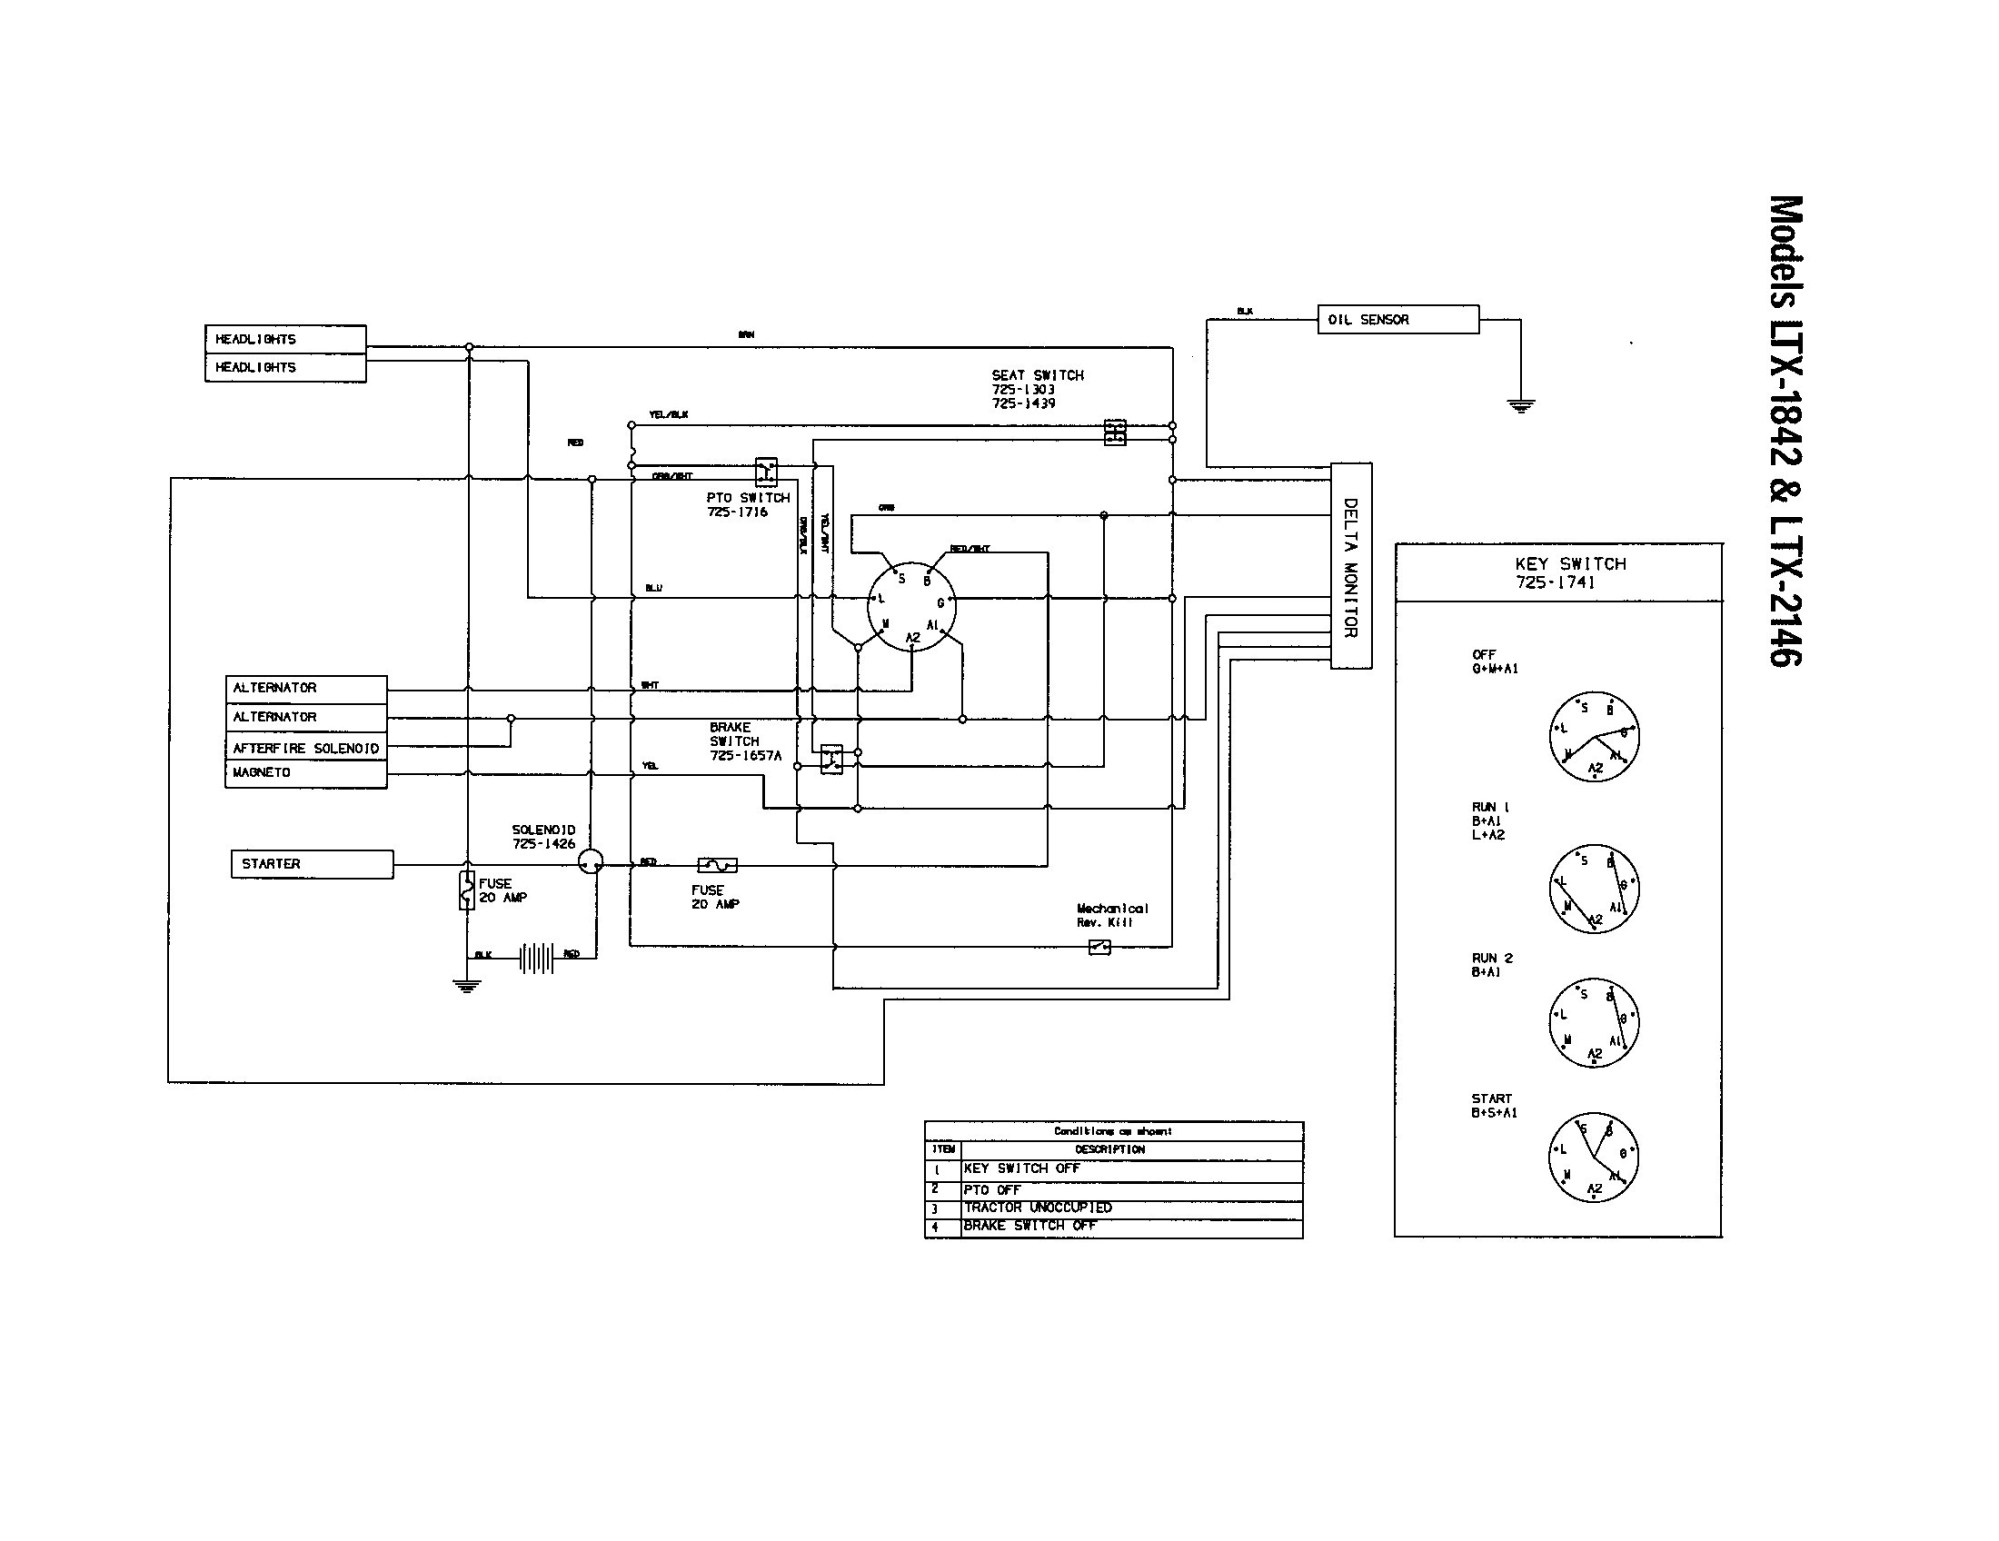 hight resolution of craftsman lawn tractor wiring diagram wiring diagram yard machine lawn tractor 2018 yard machine 42